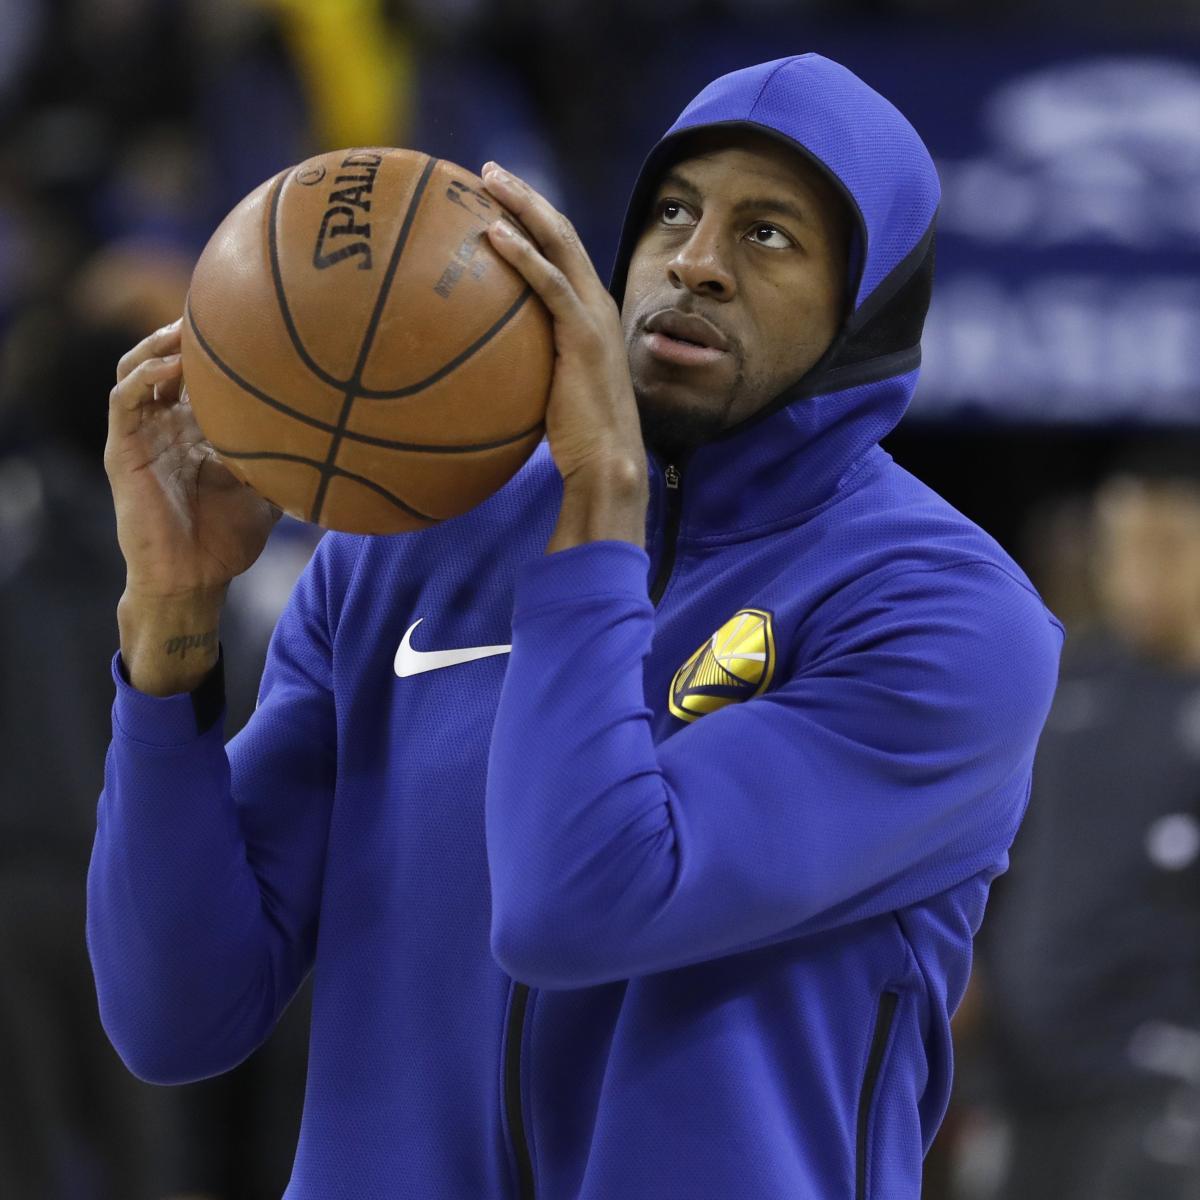 Portland Blazer Rumors: Andre Iguodala Fined $25,000 For Throwing Ball In Crowd Vs